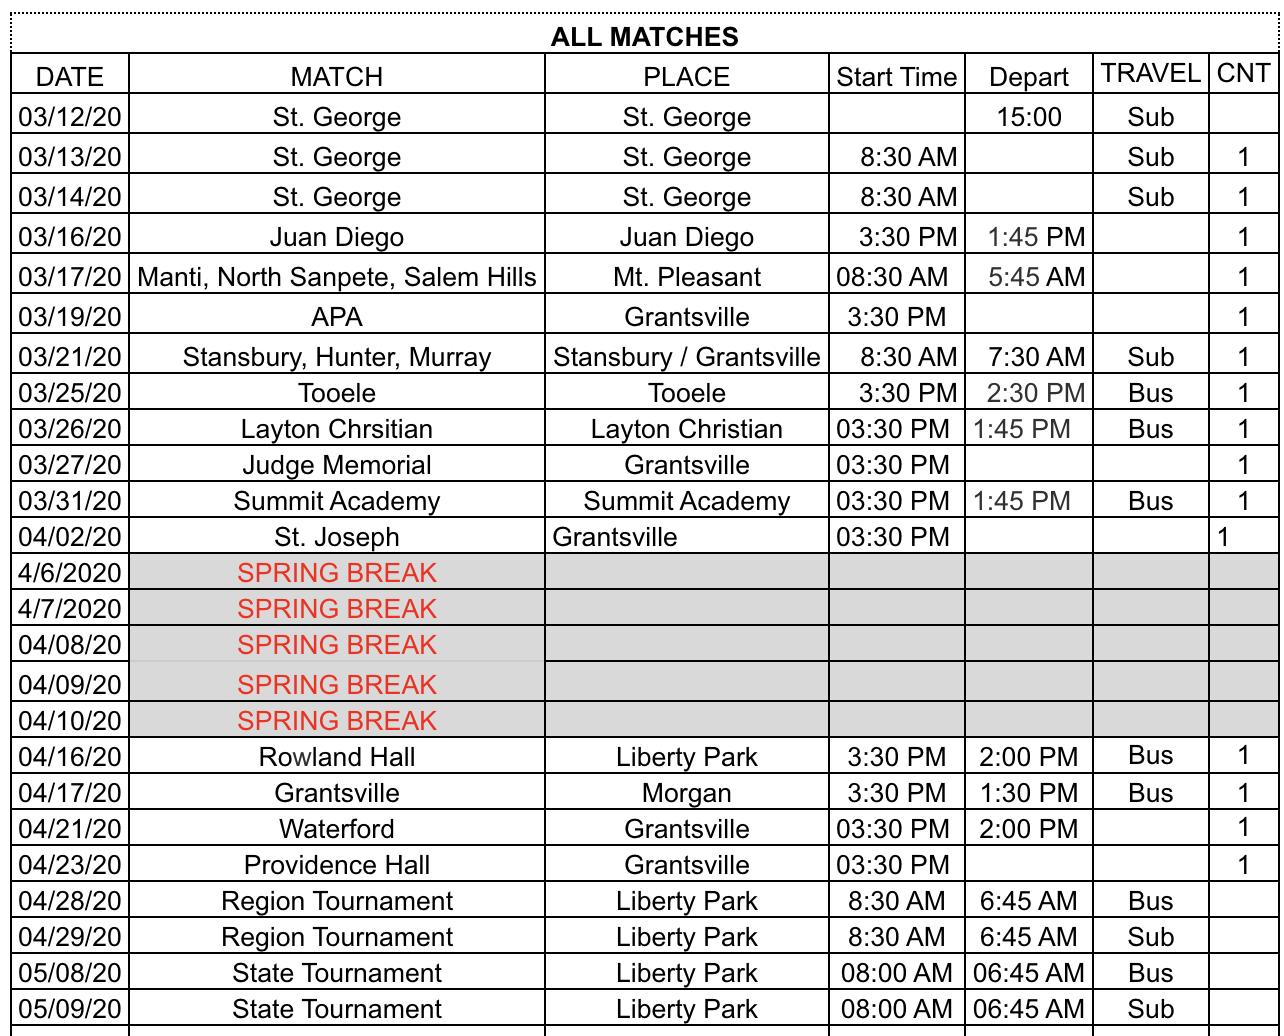 Tennis Schedule - updated 28 Feb 2020